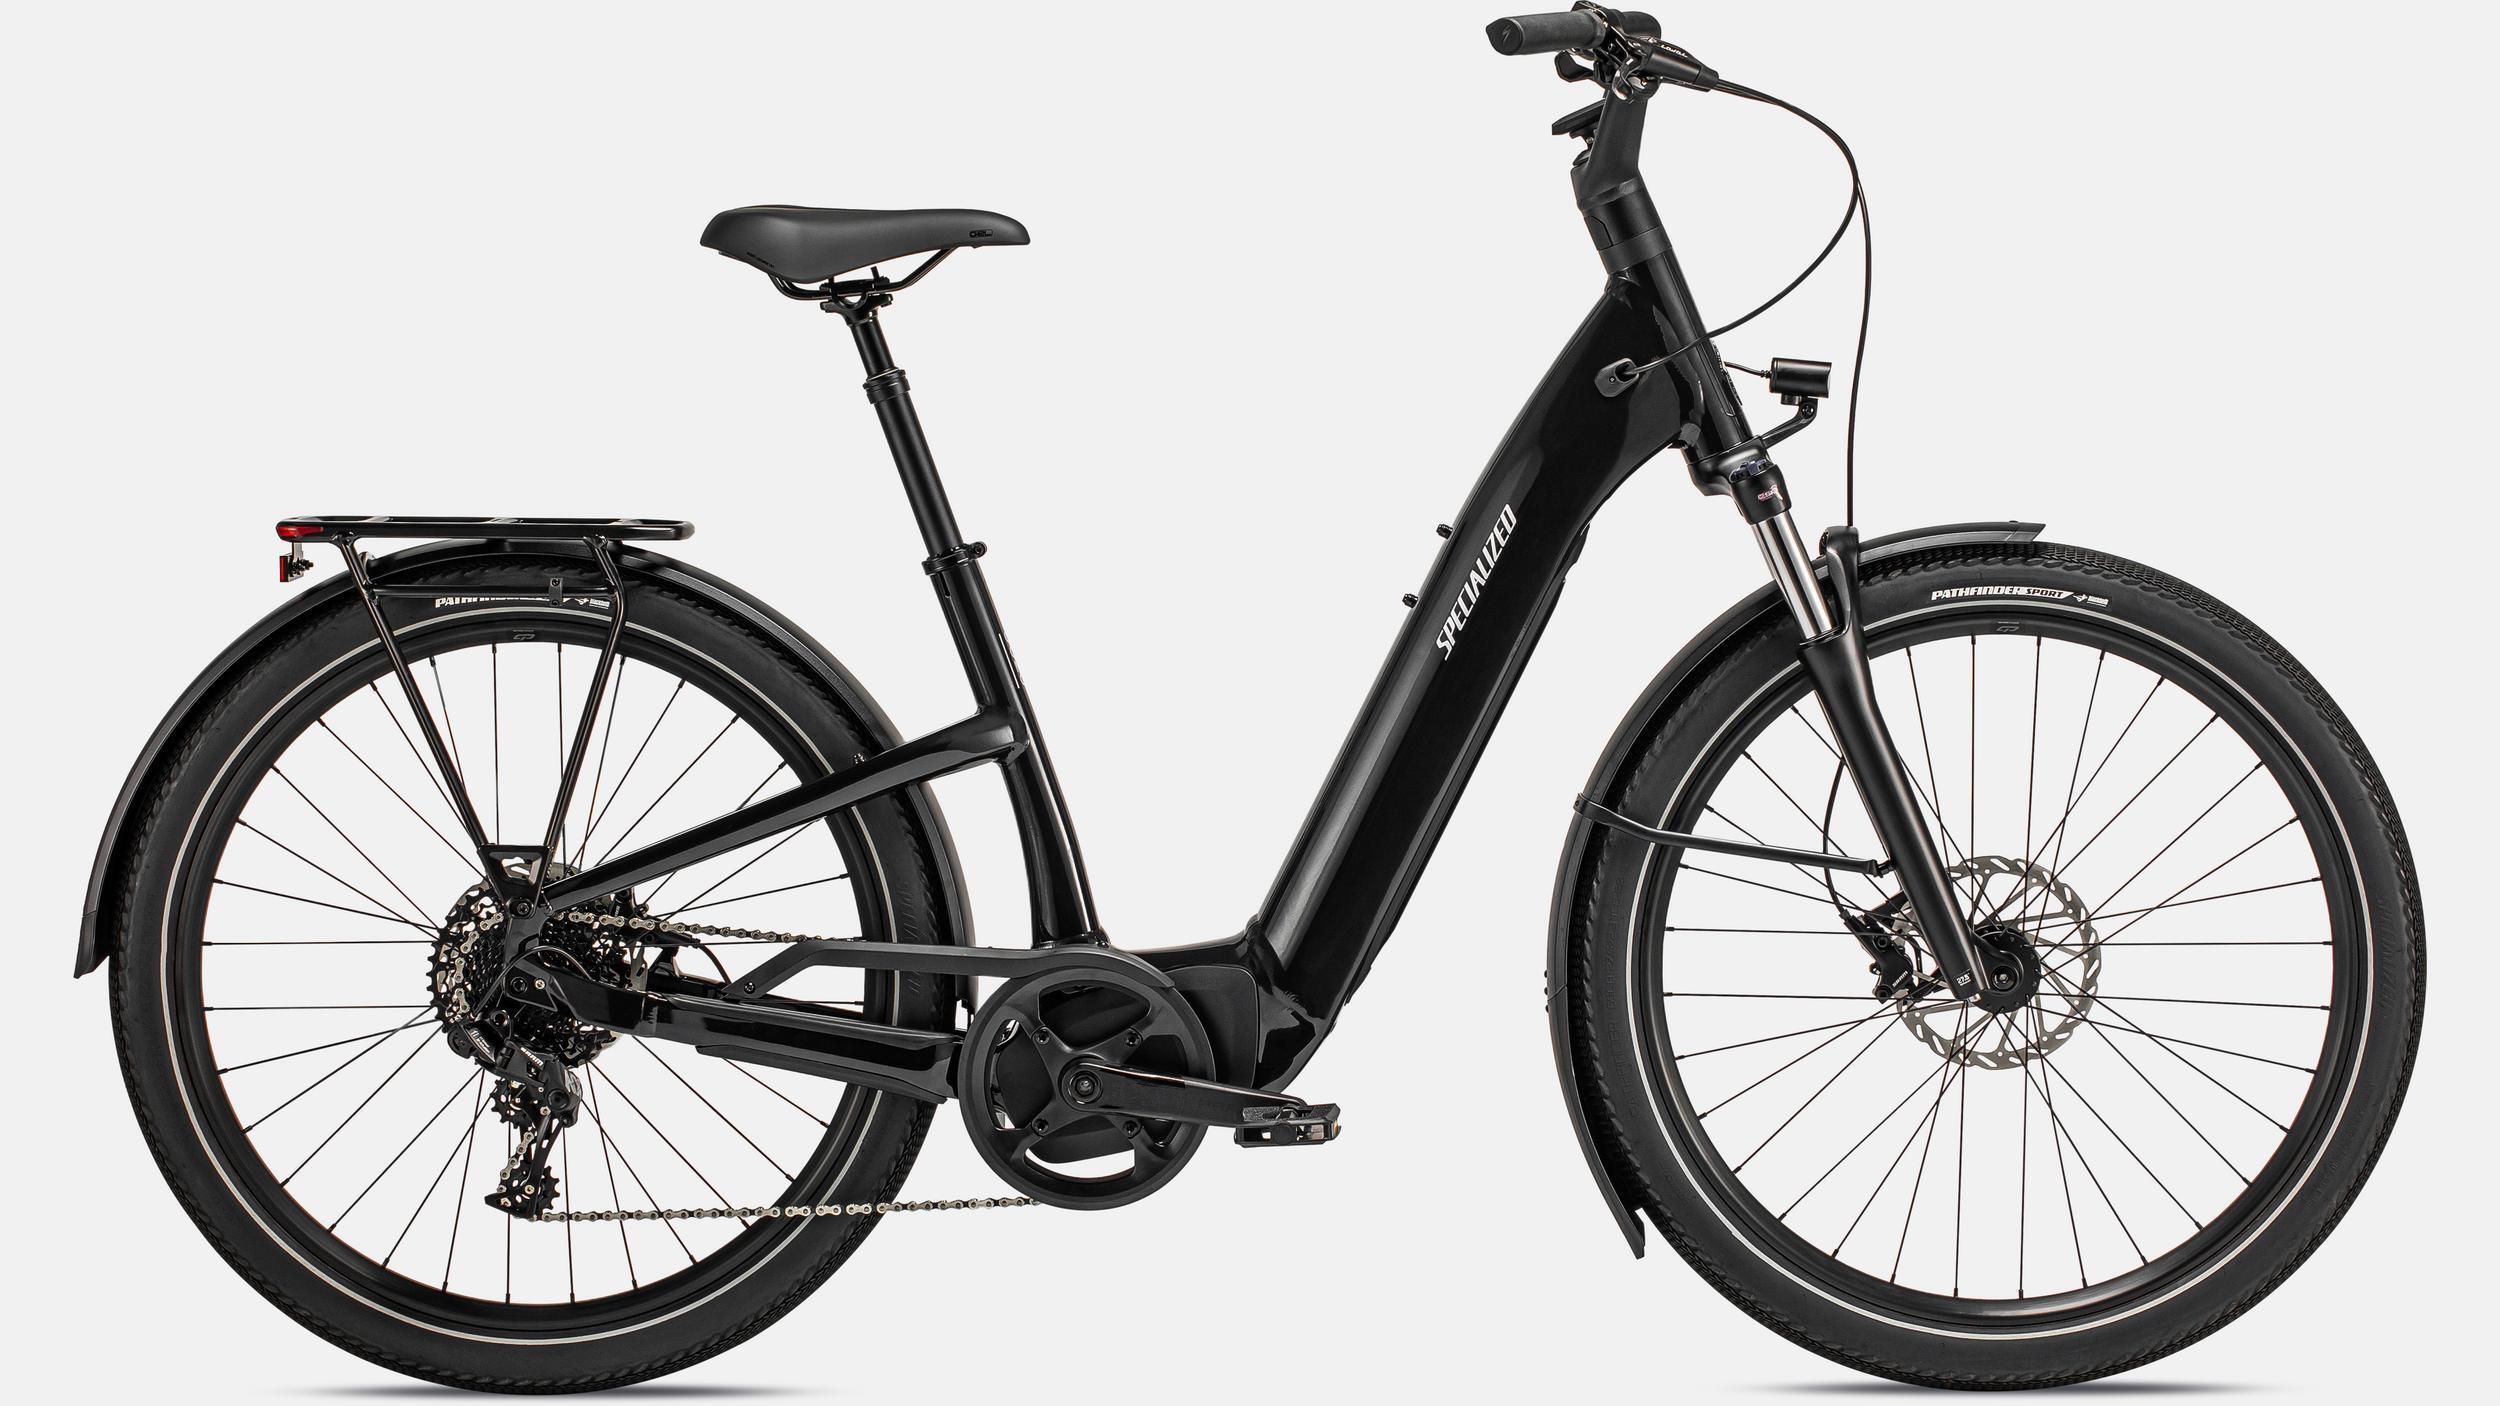 Trek Powerfly Fs 4 500 W Electric Mountain Bike 2021 Gunmetal/black